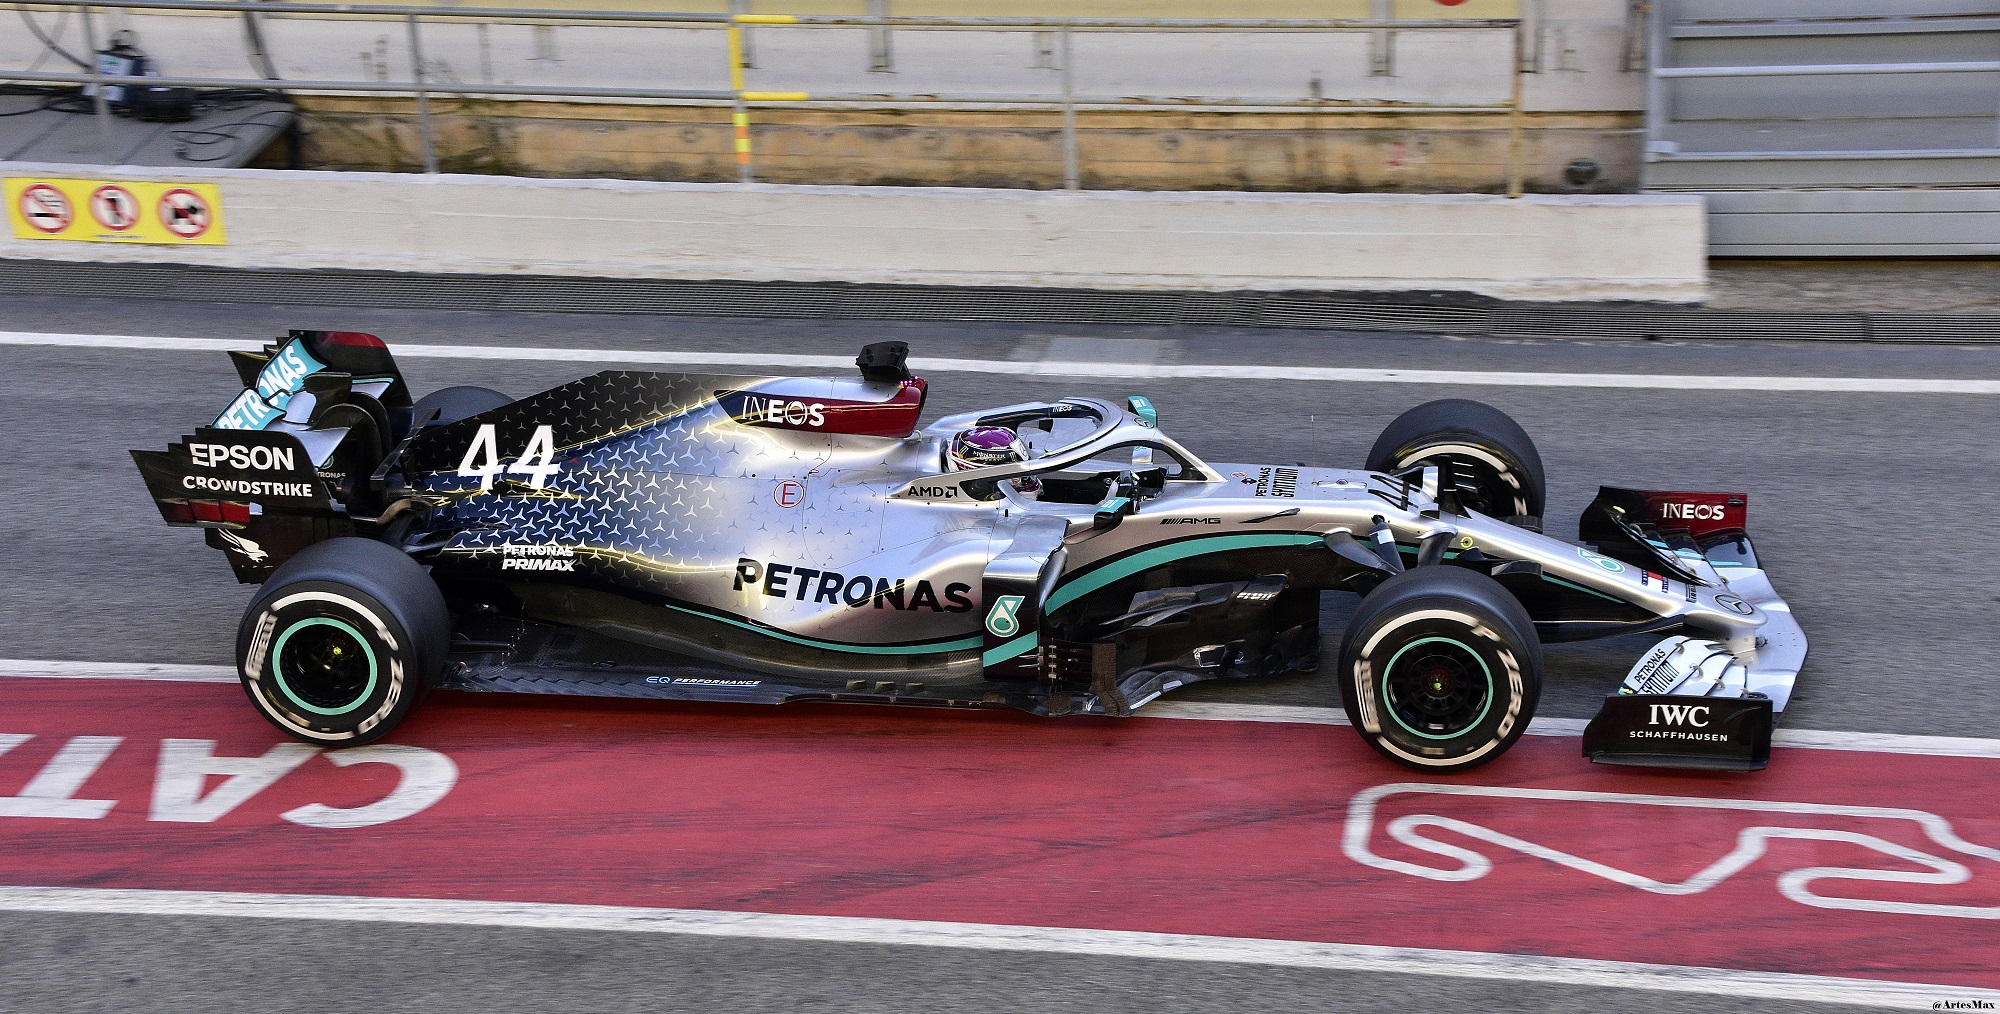 Vijfdaagse vliegreis – Formule 1 Spanje – Barcelona 2021